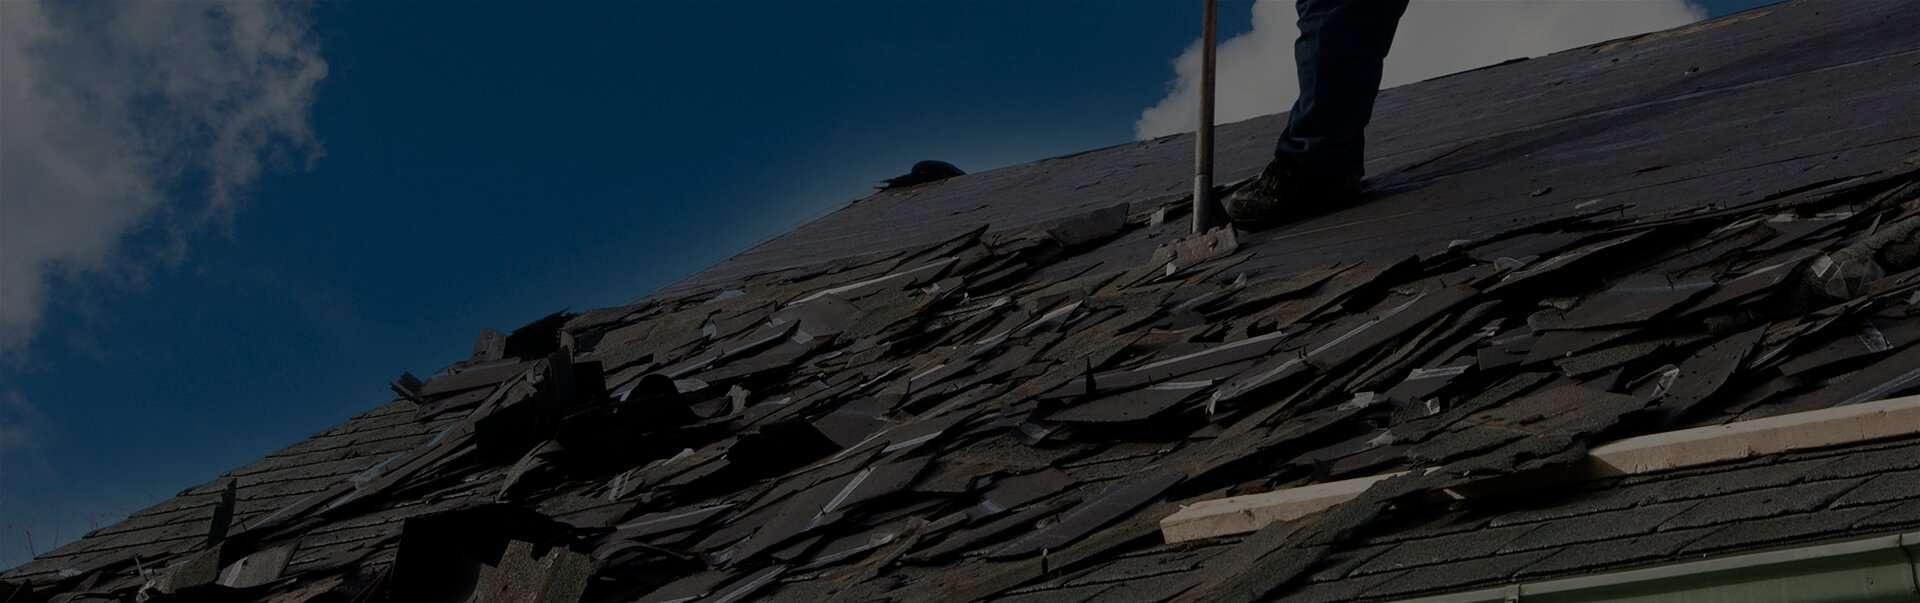 Storm Damage Roof Repair Austin Tx Transcendent Roofing